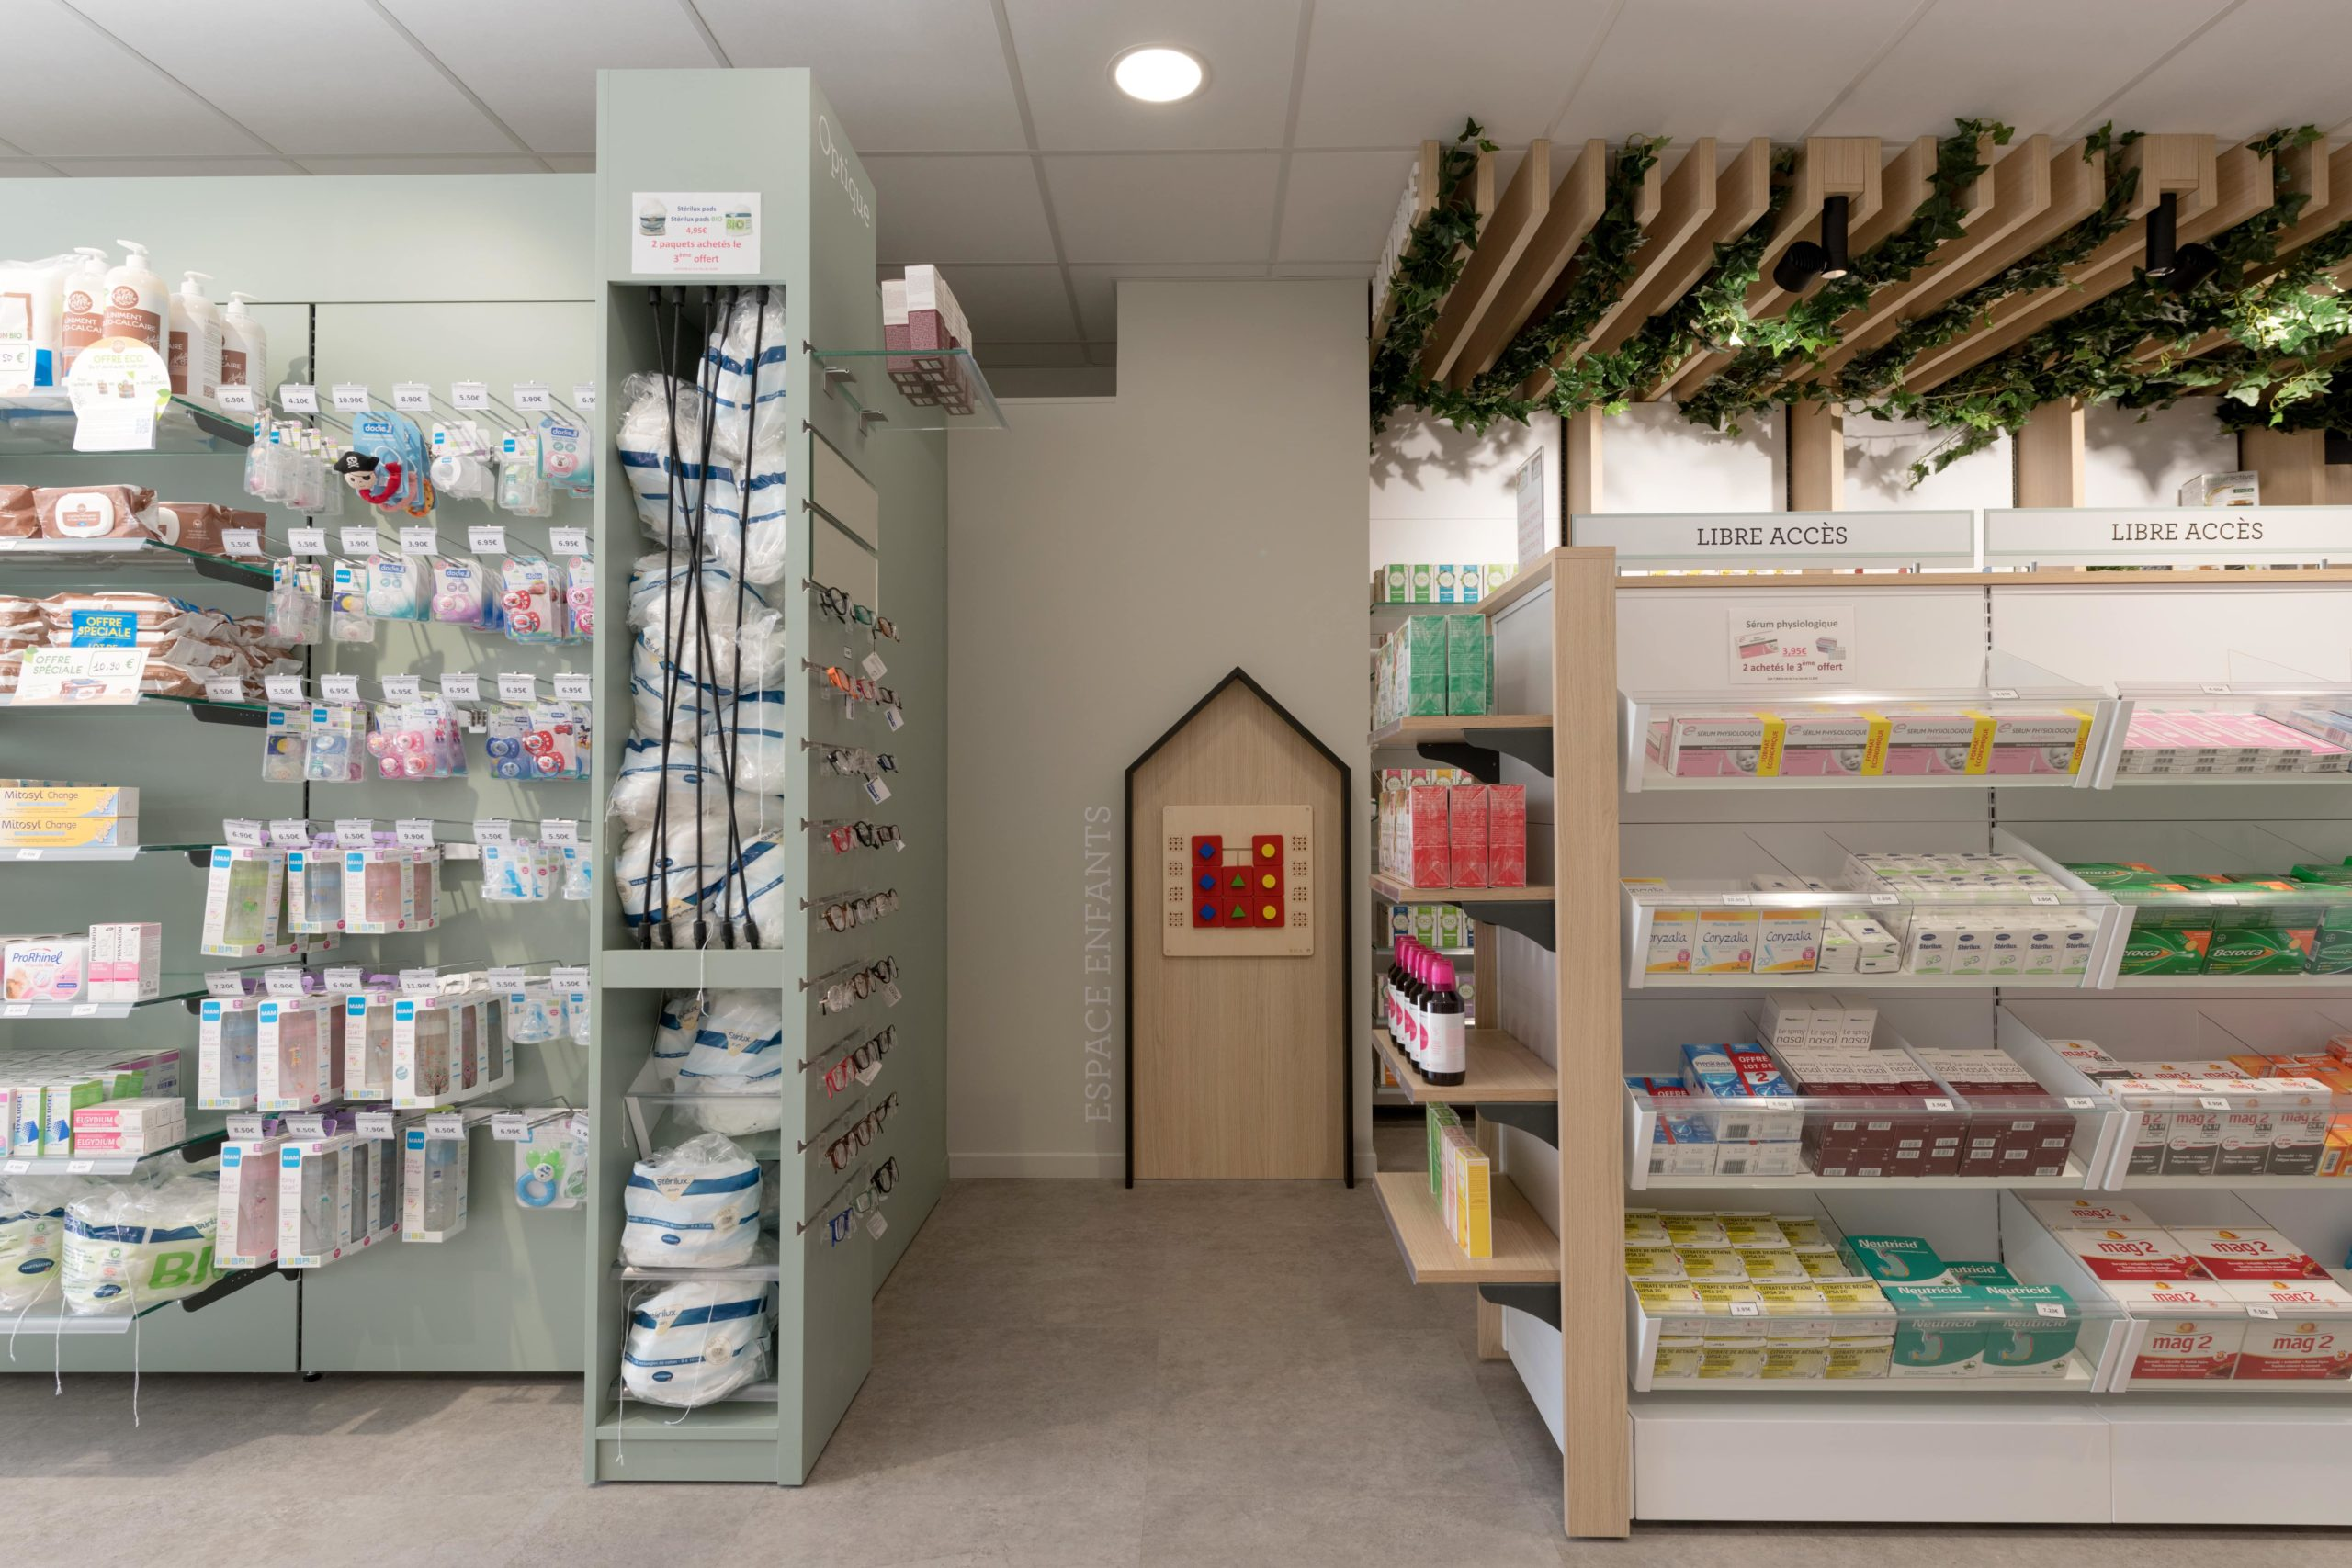 Cubik-Agenceur-Pharmacie-Gare-StEtienne-2975-min